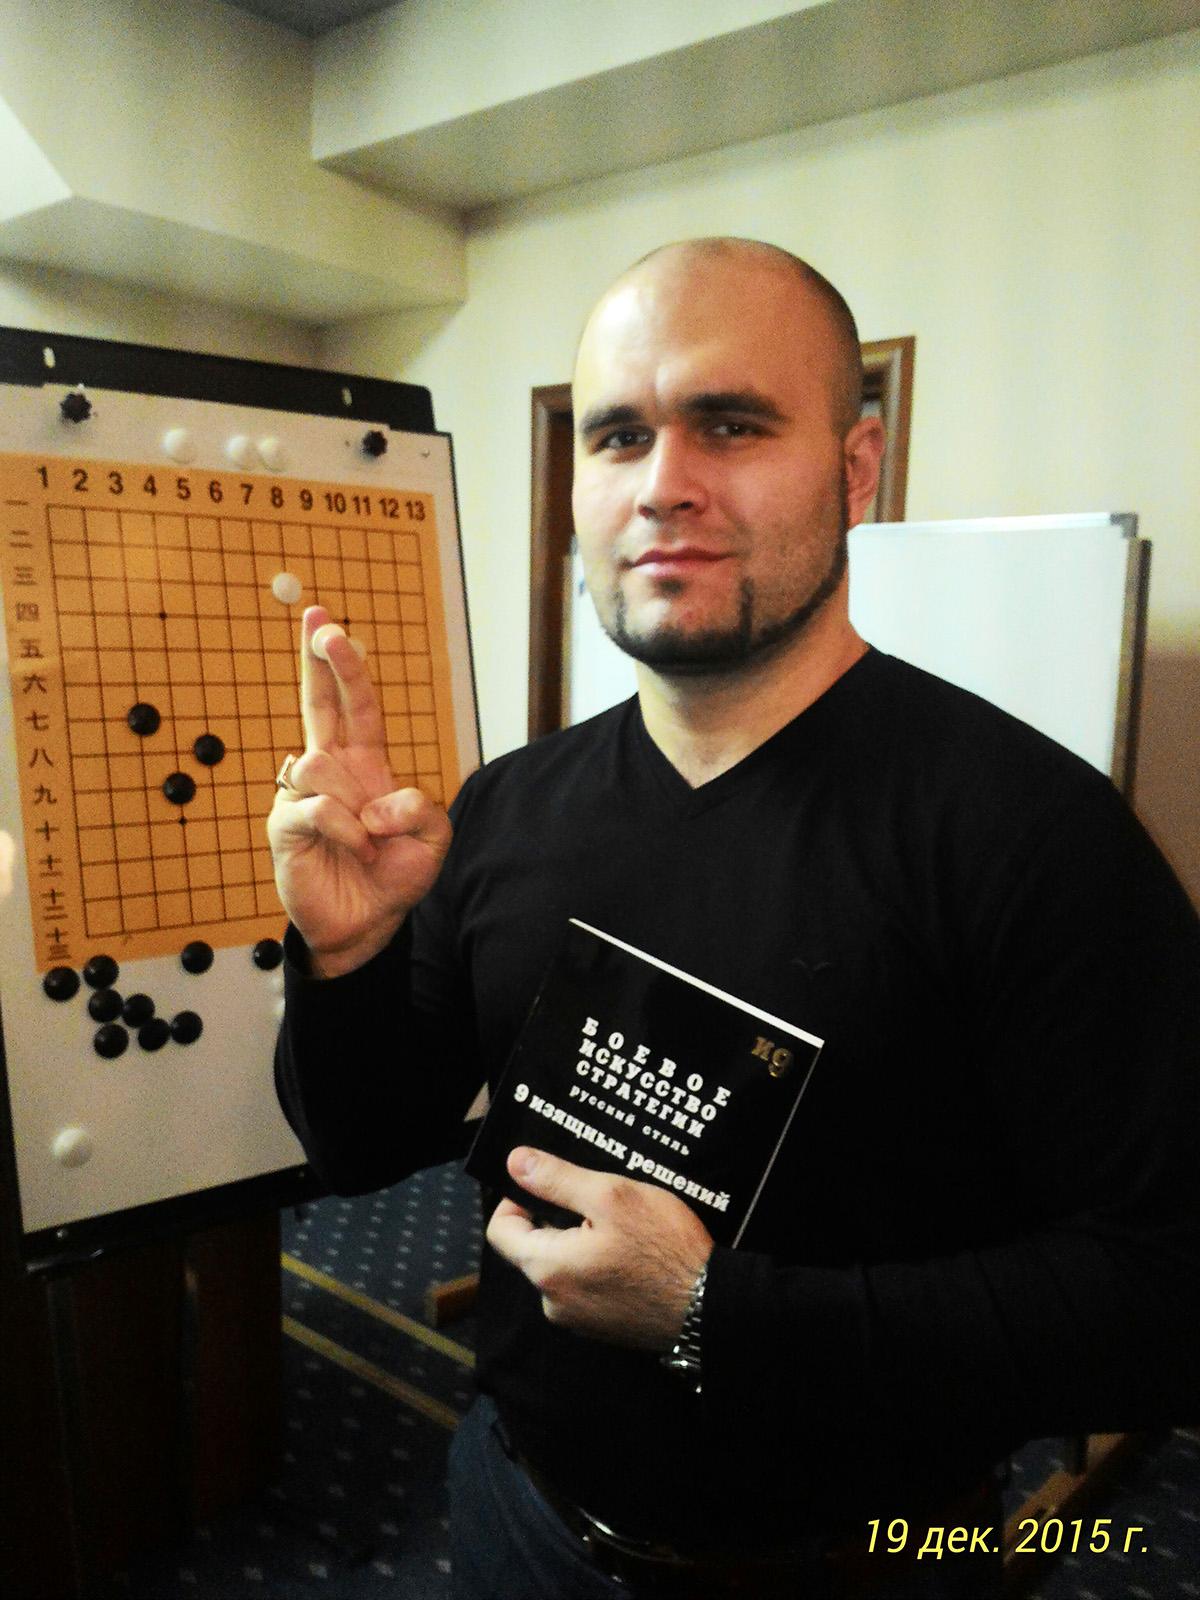 Сослан Джабиев